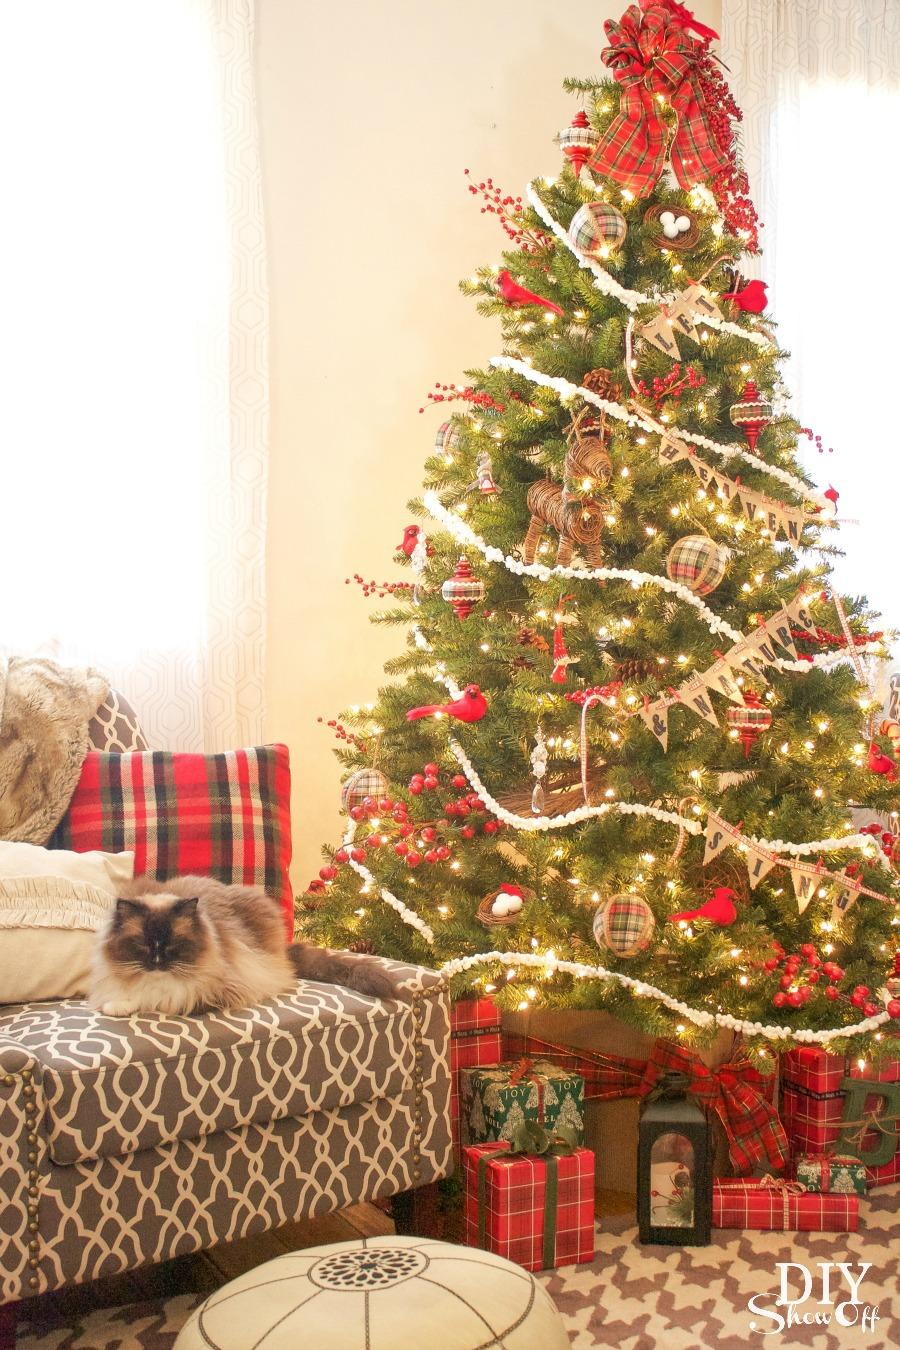 birds and berries Christmas tree #michaelsmakers @diyshowoff Dream Tree Challenge